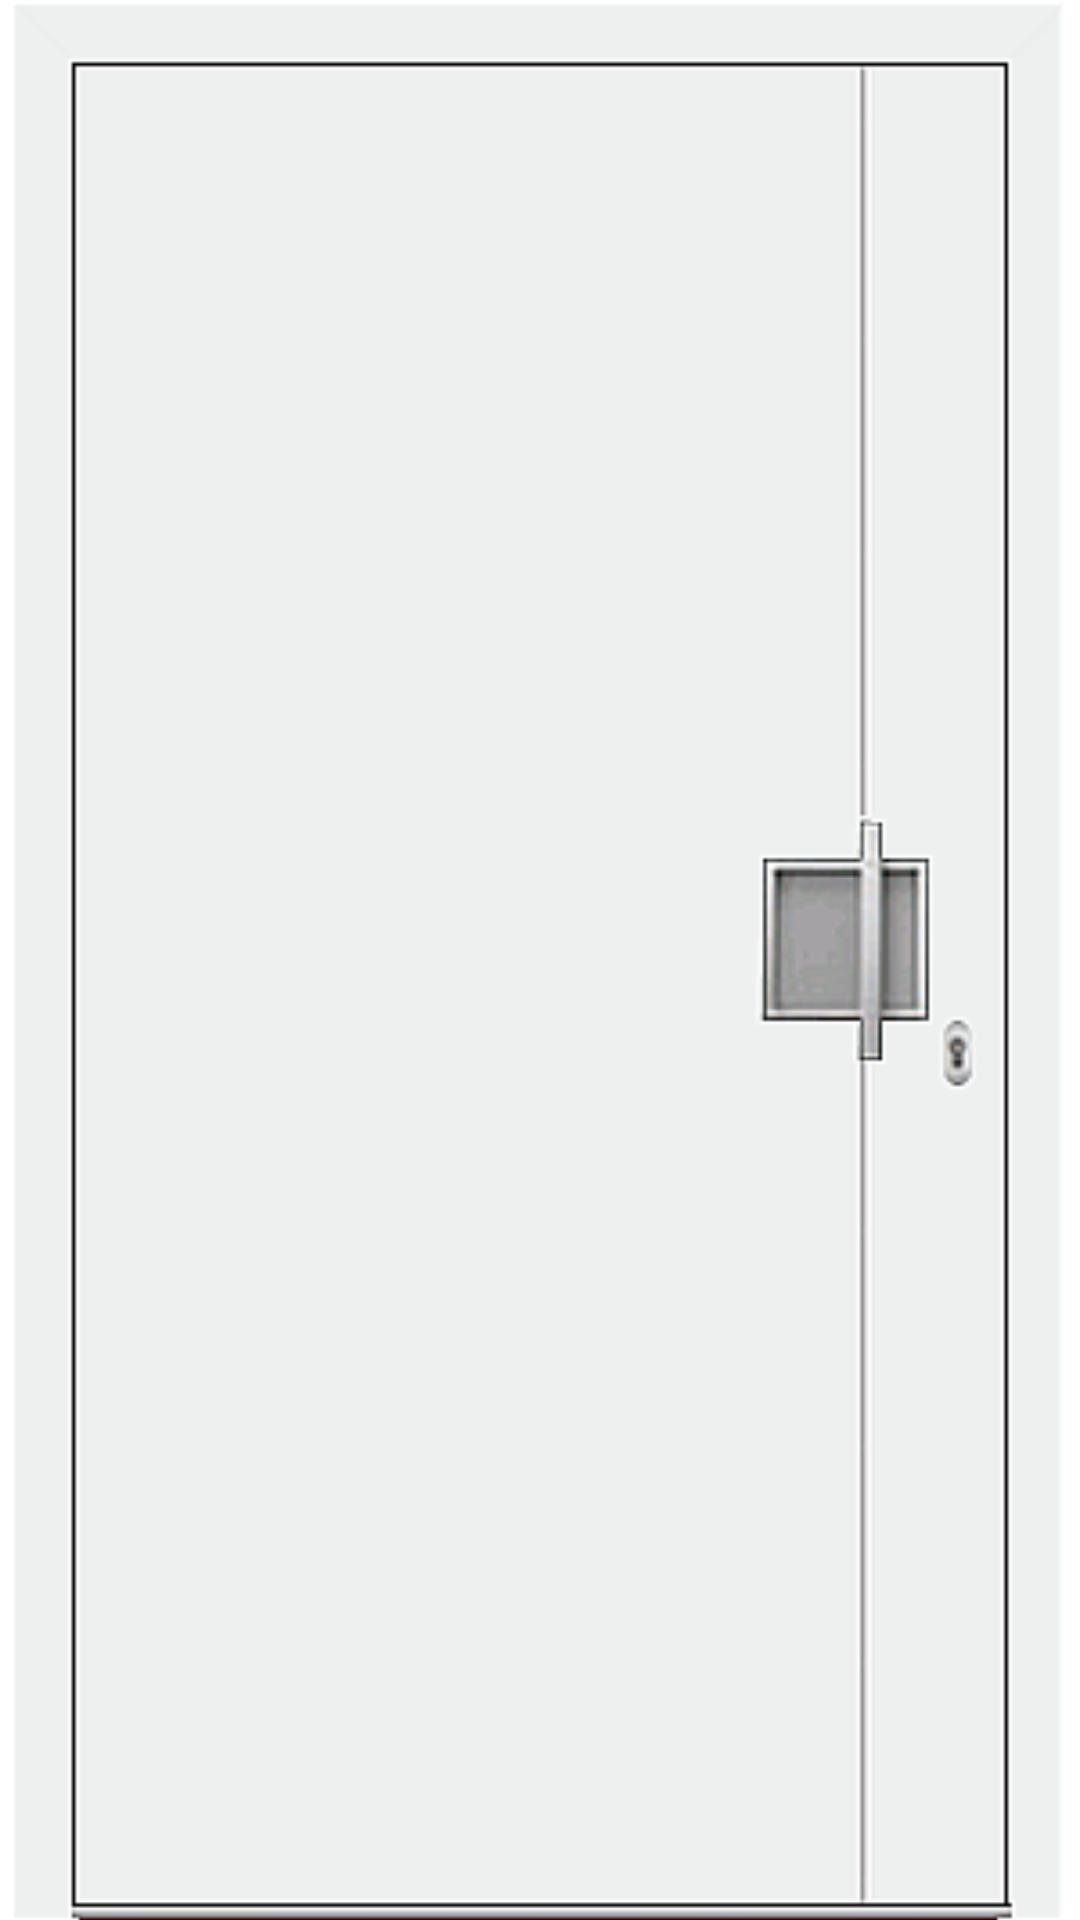 Aluminium Haustür Modell 6971-92 weiß